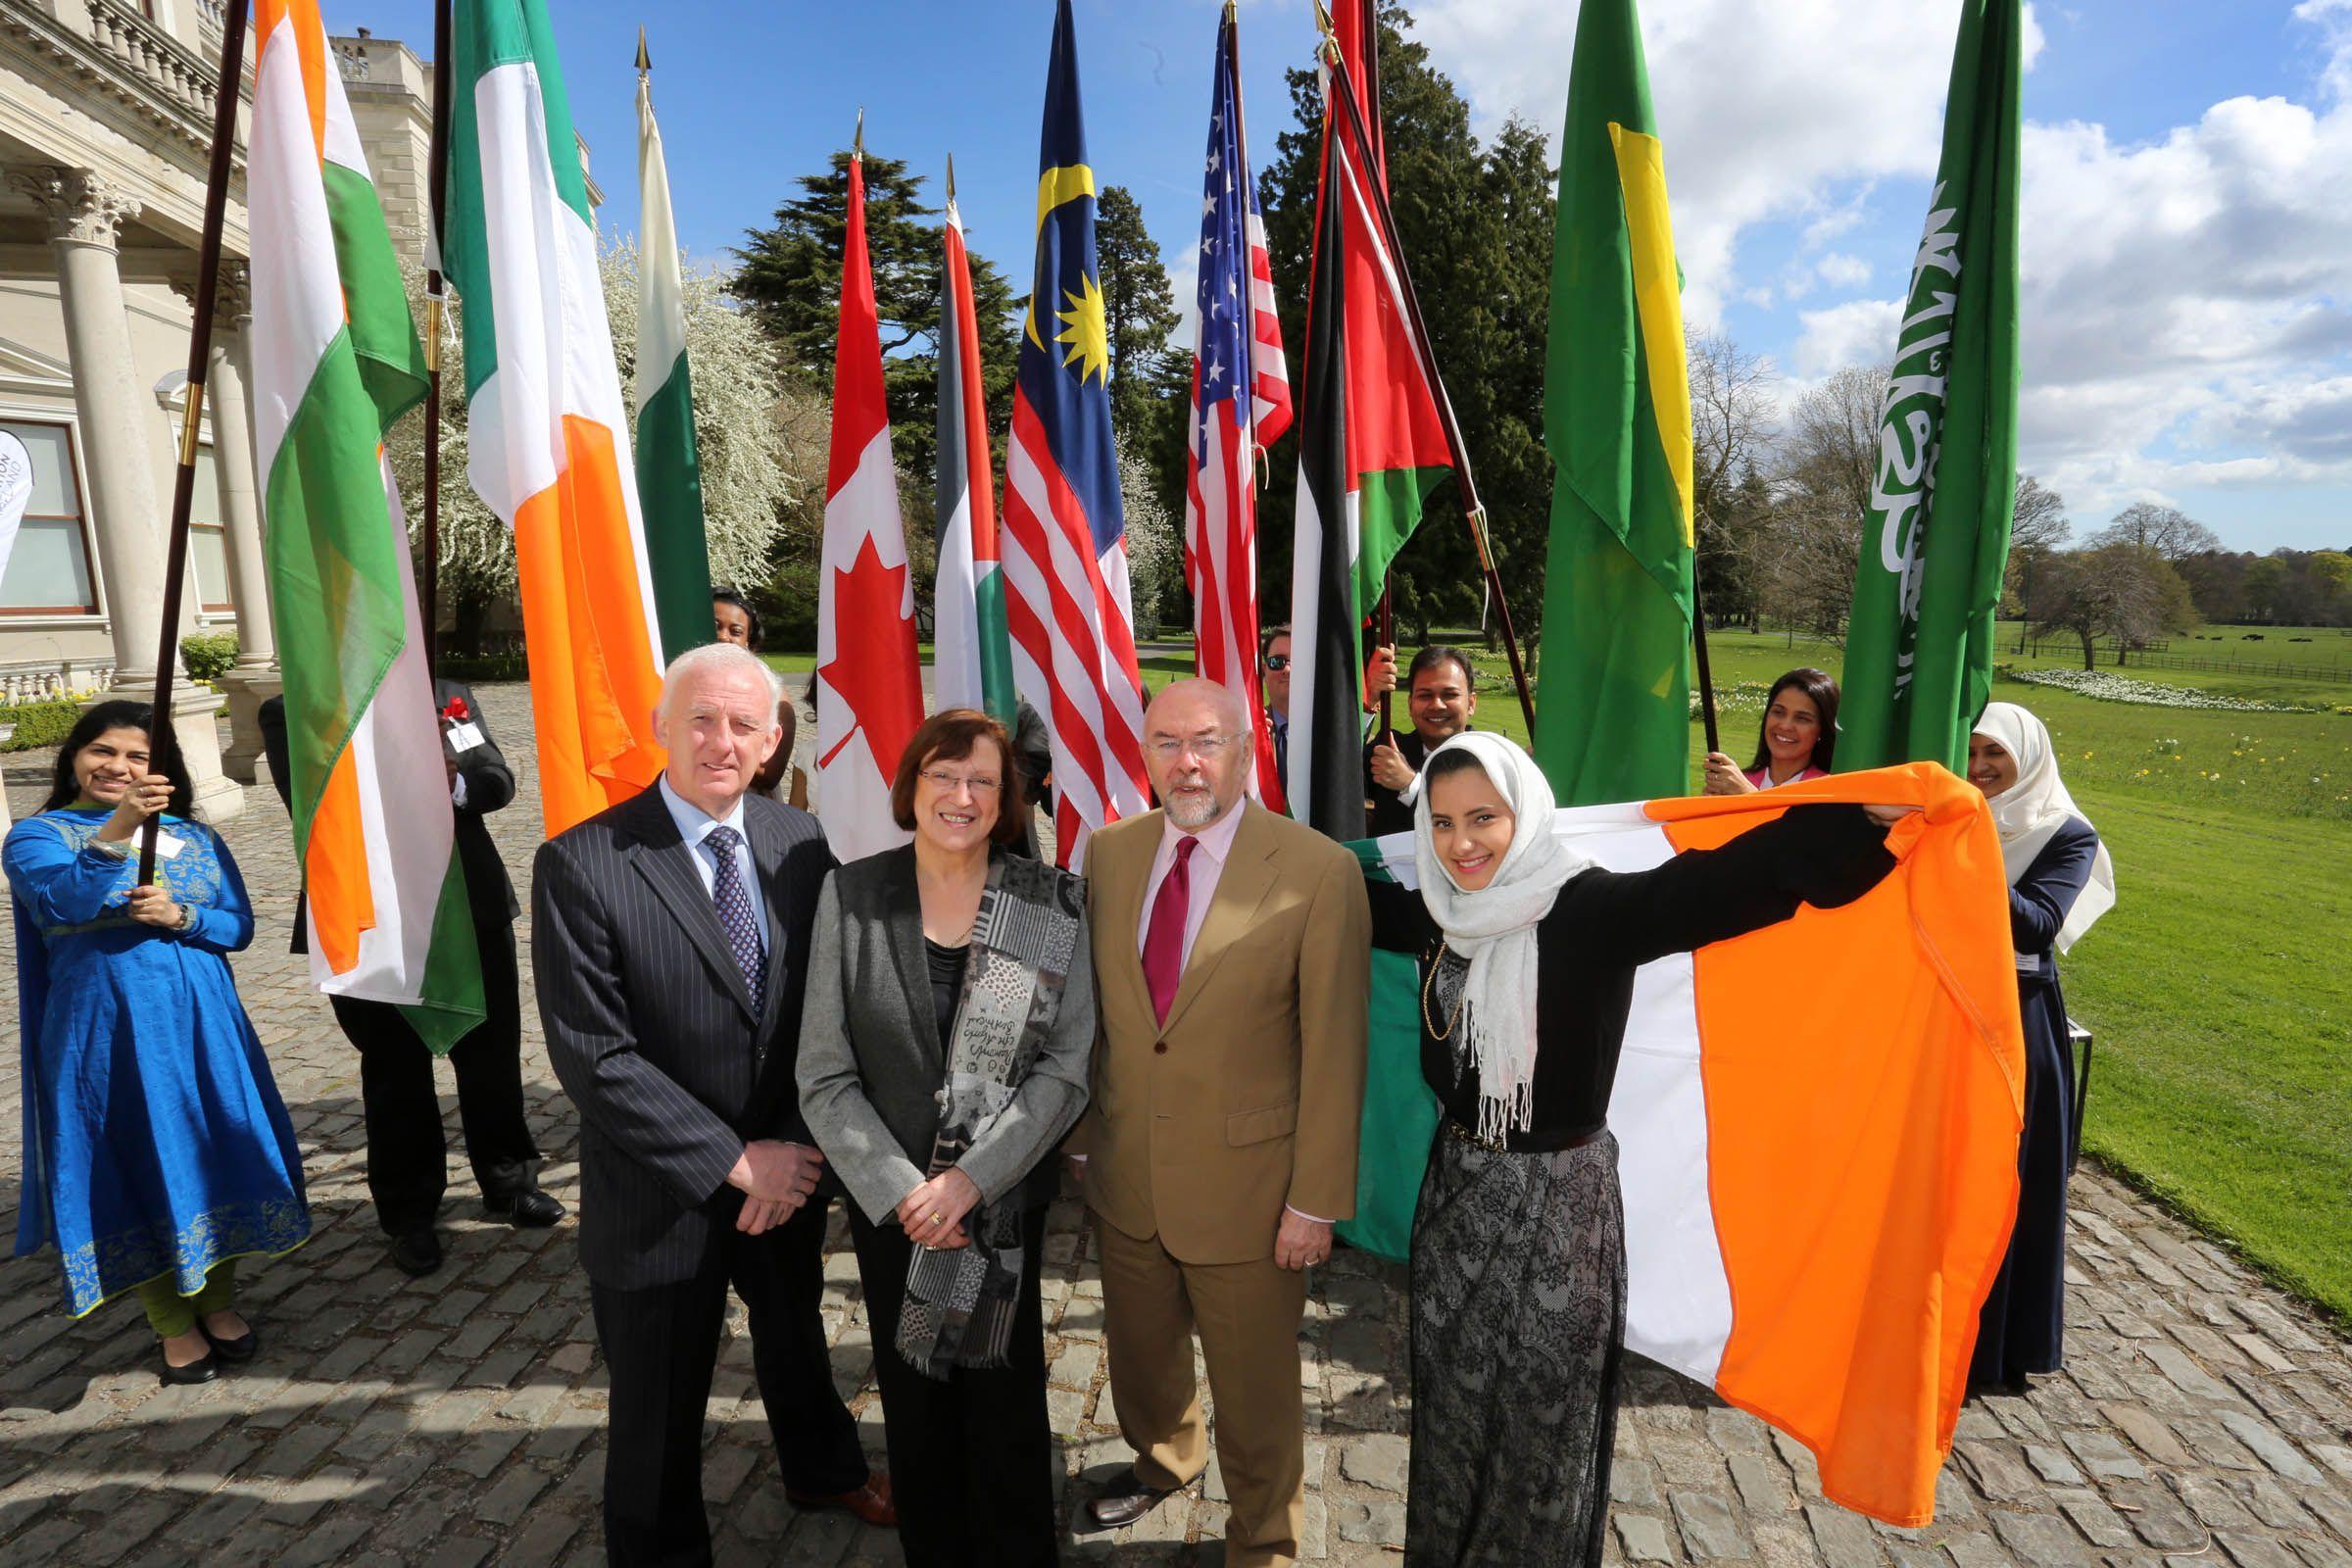 Education in Ireland Student Ambassador ceremony at Farmleigh (2014)